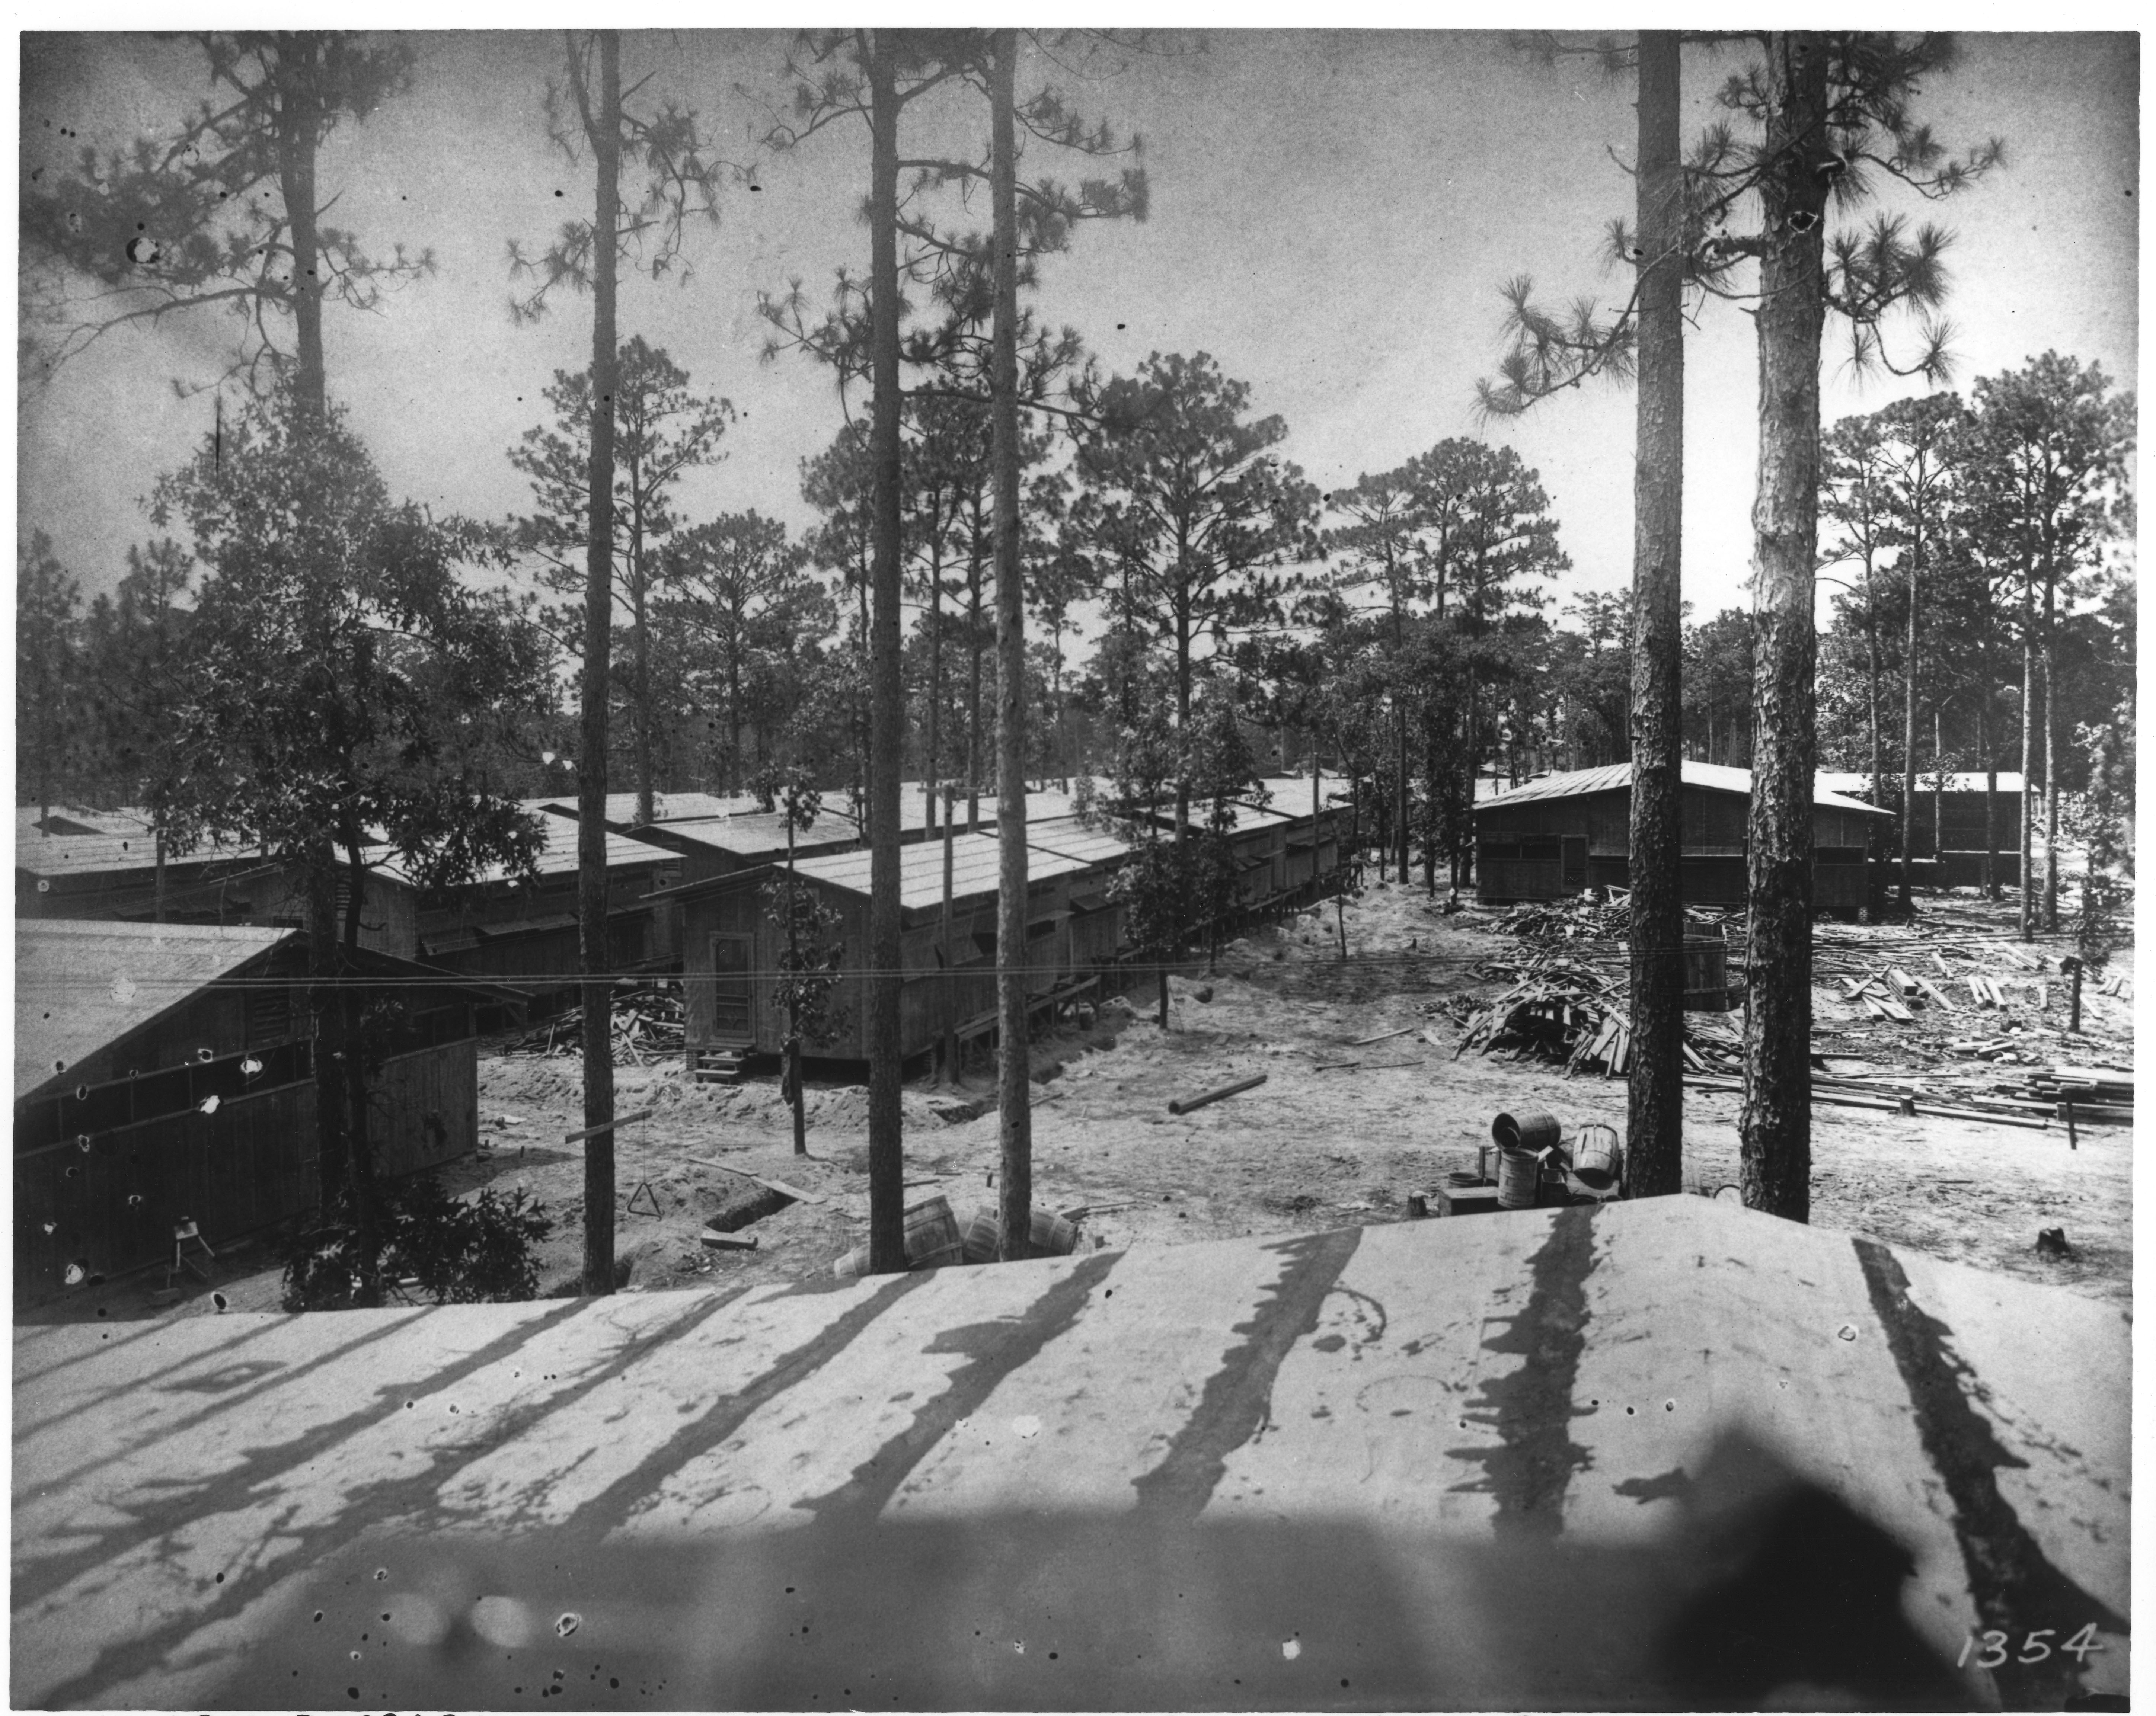 Barracks of Naval Training Camp